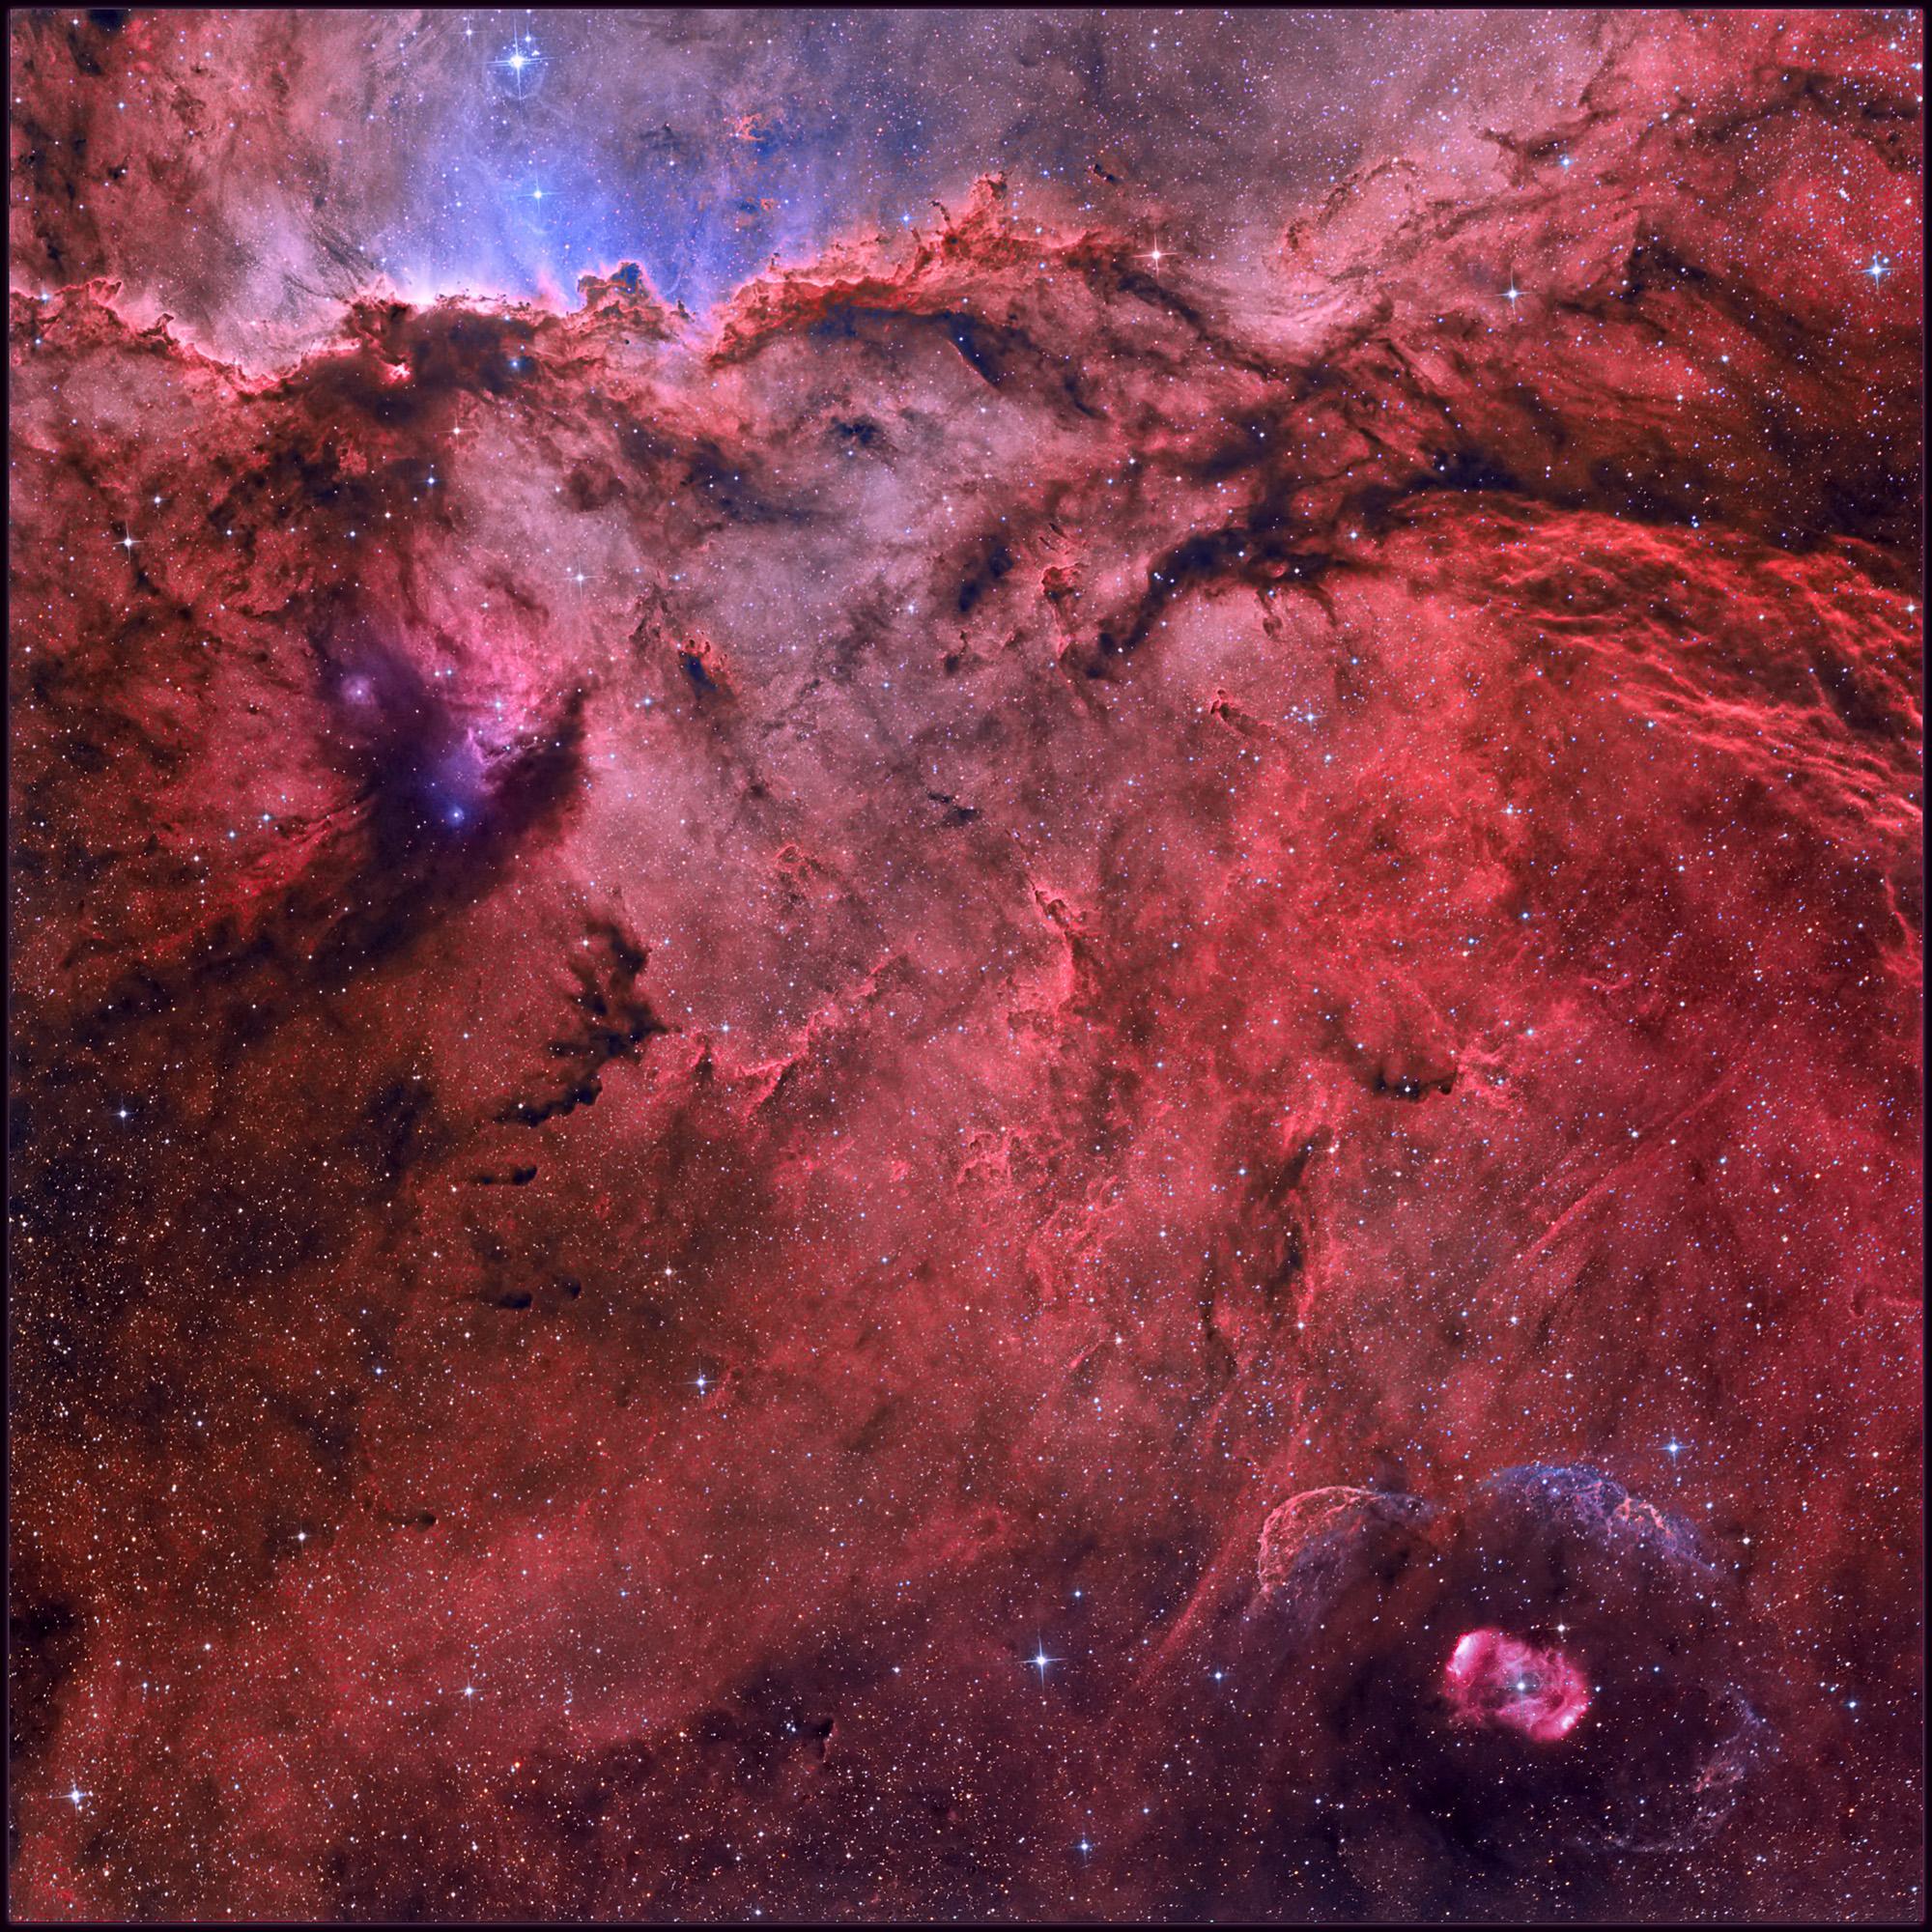 NGC 6188 et NGC 6164